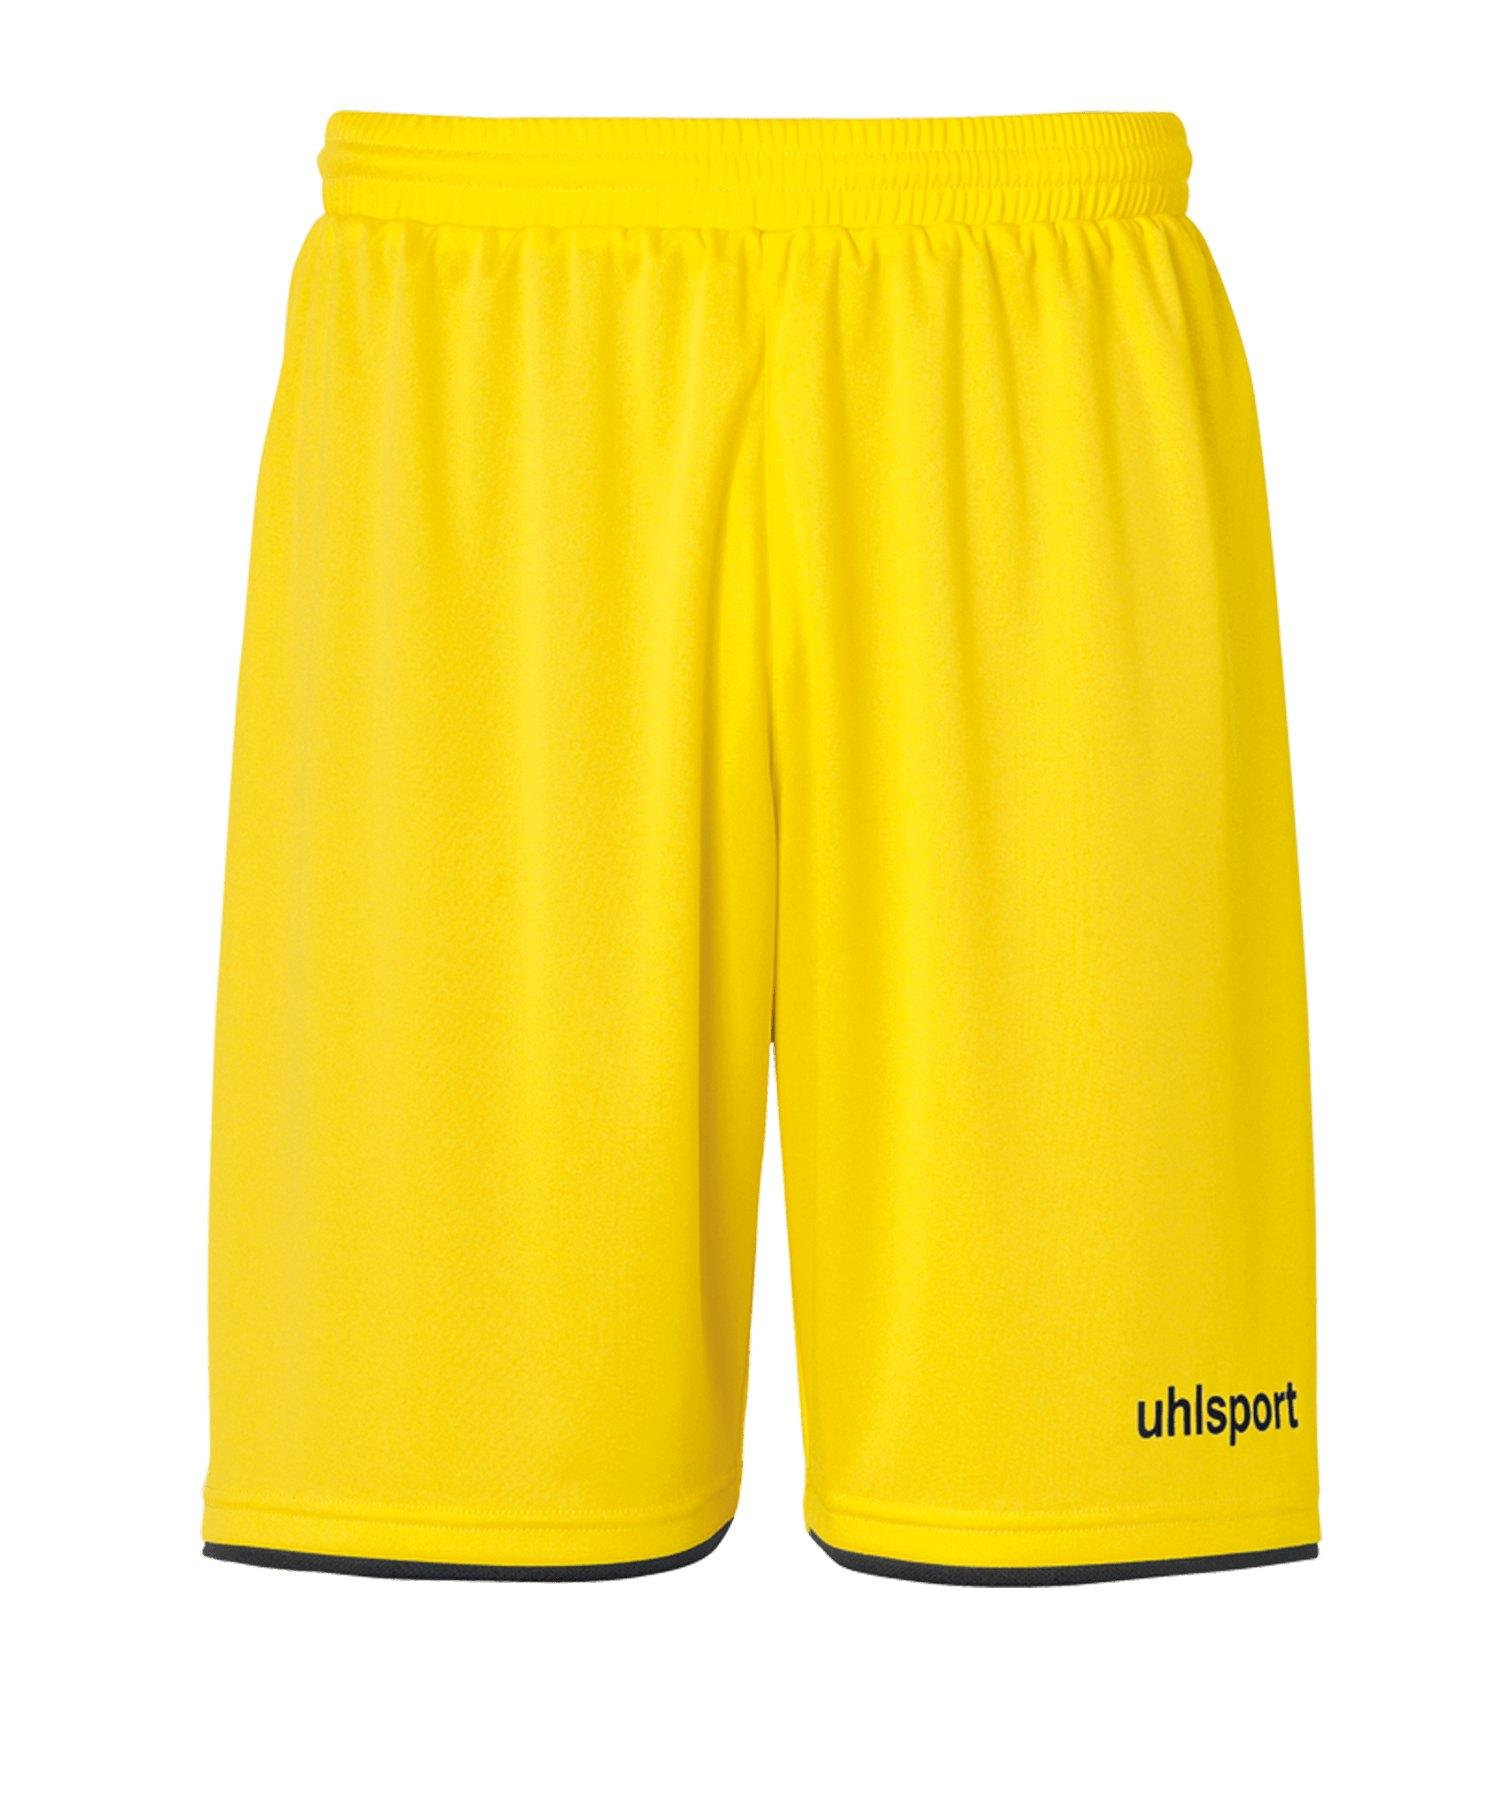 Uhlsport Club Short Gelb Schwarz F07 - gelb